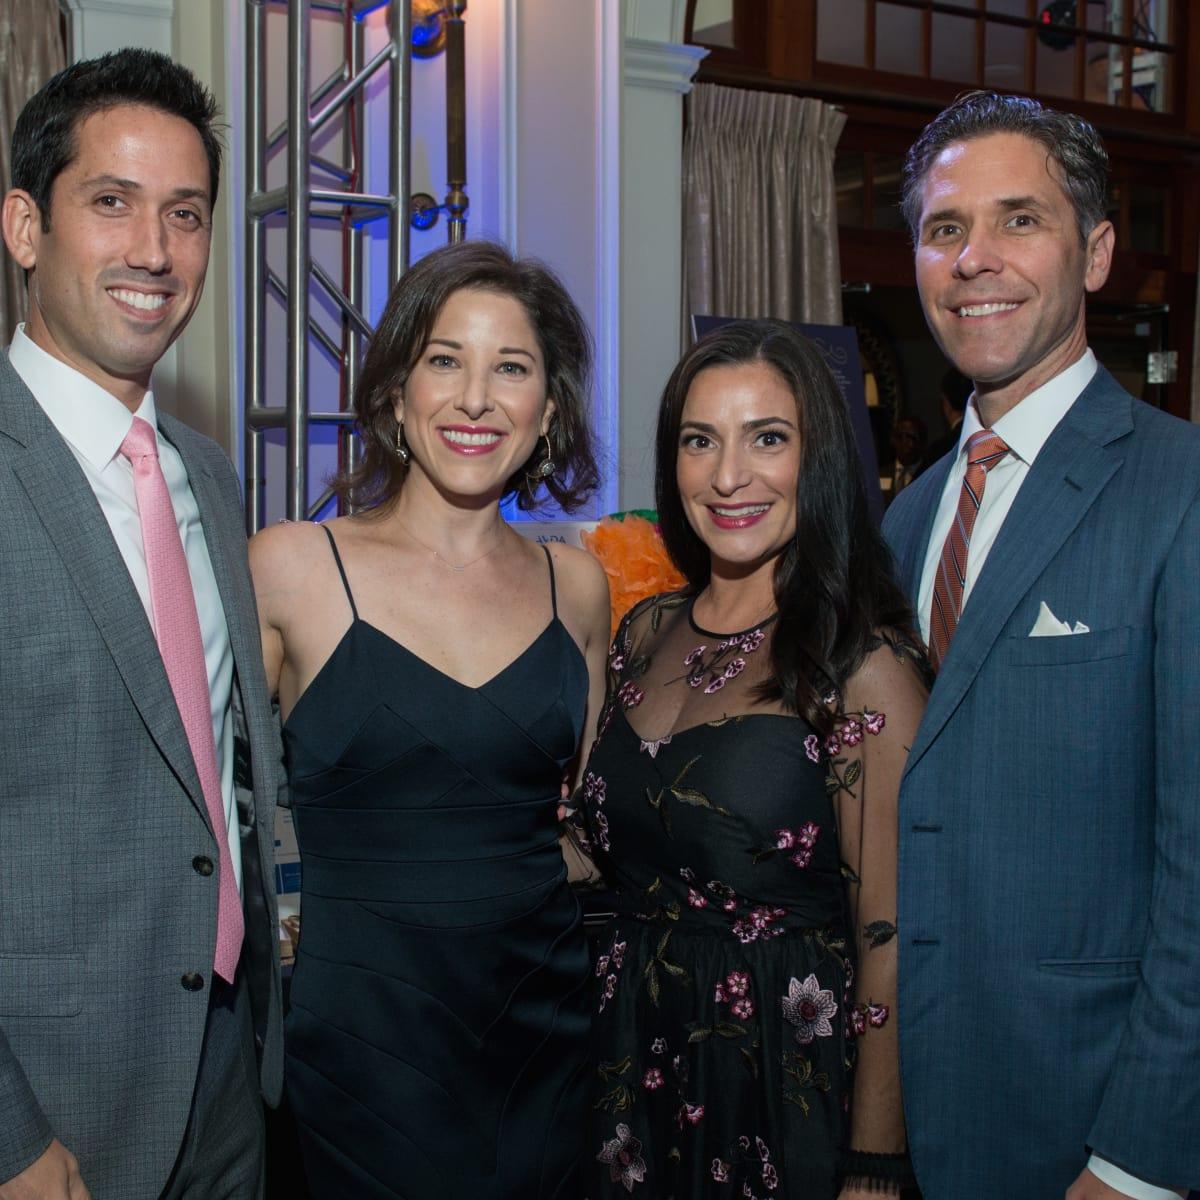 ug and Esther Freedman, Candace and Brian Thomas at AVDA Gala